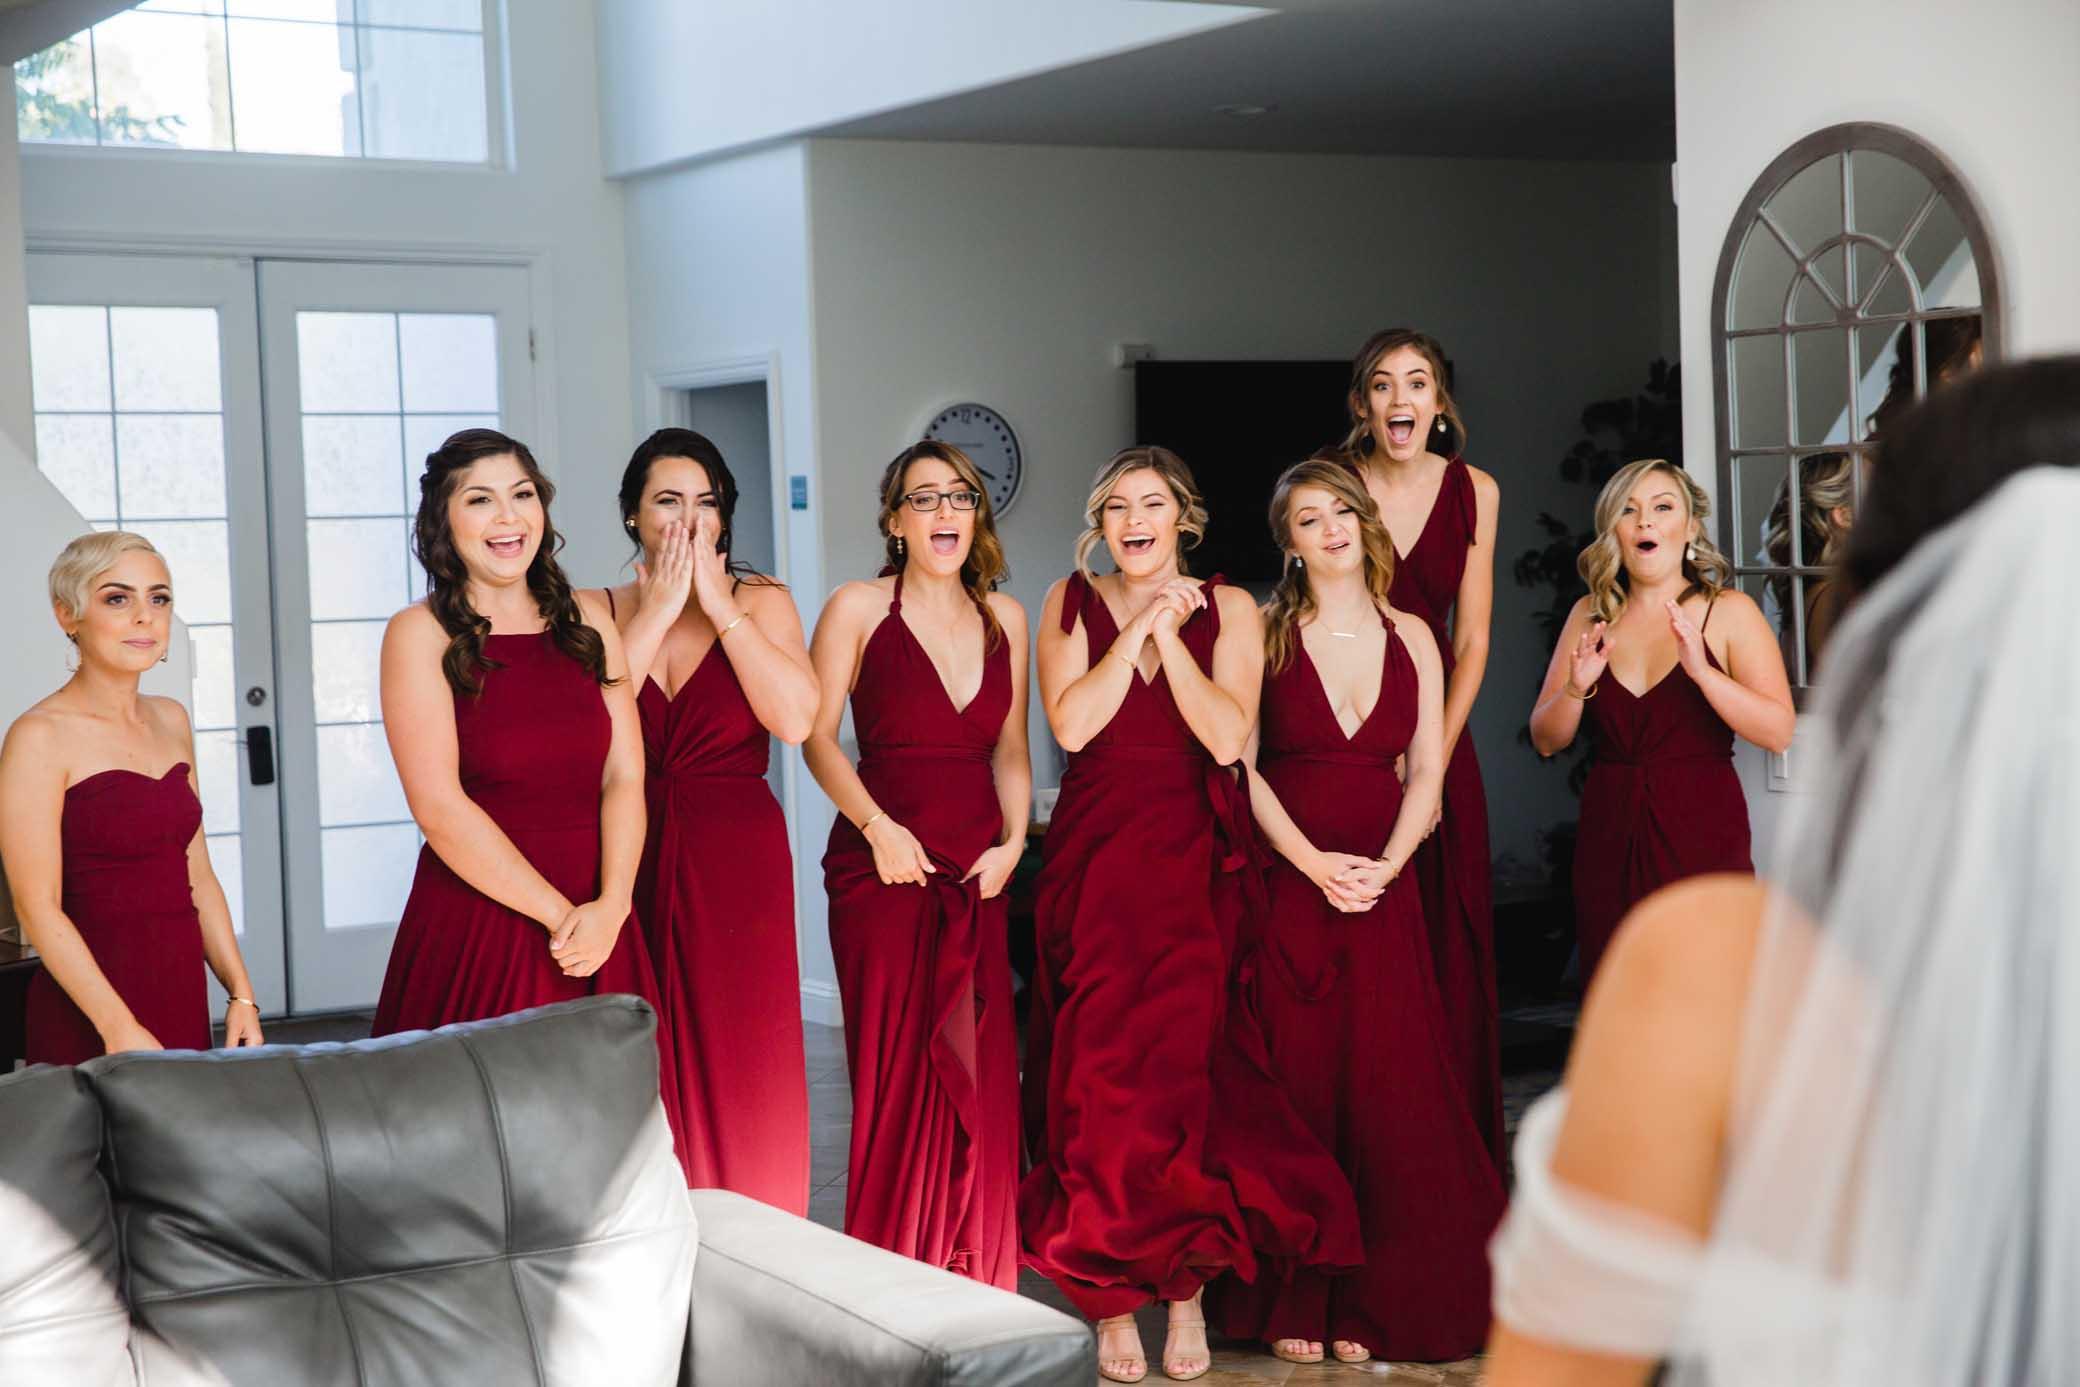 Bishop Photo lesbian gay lgbt wedding marriage USA American photography Dancing With Her Australian magazine